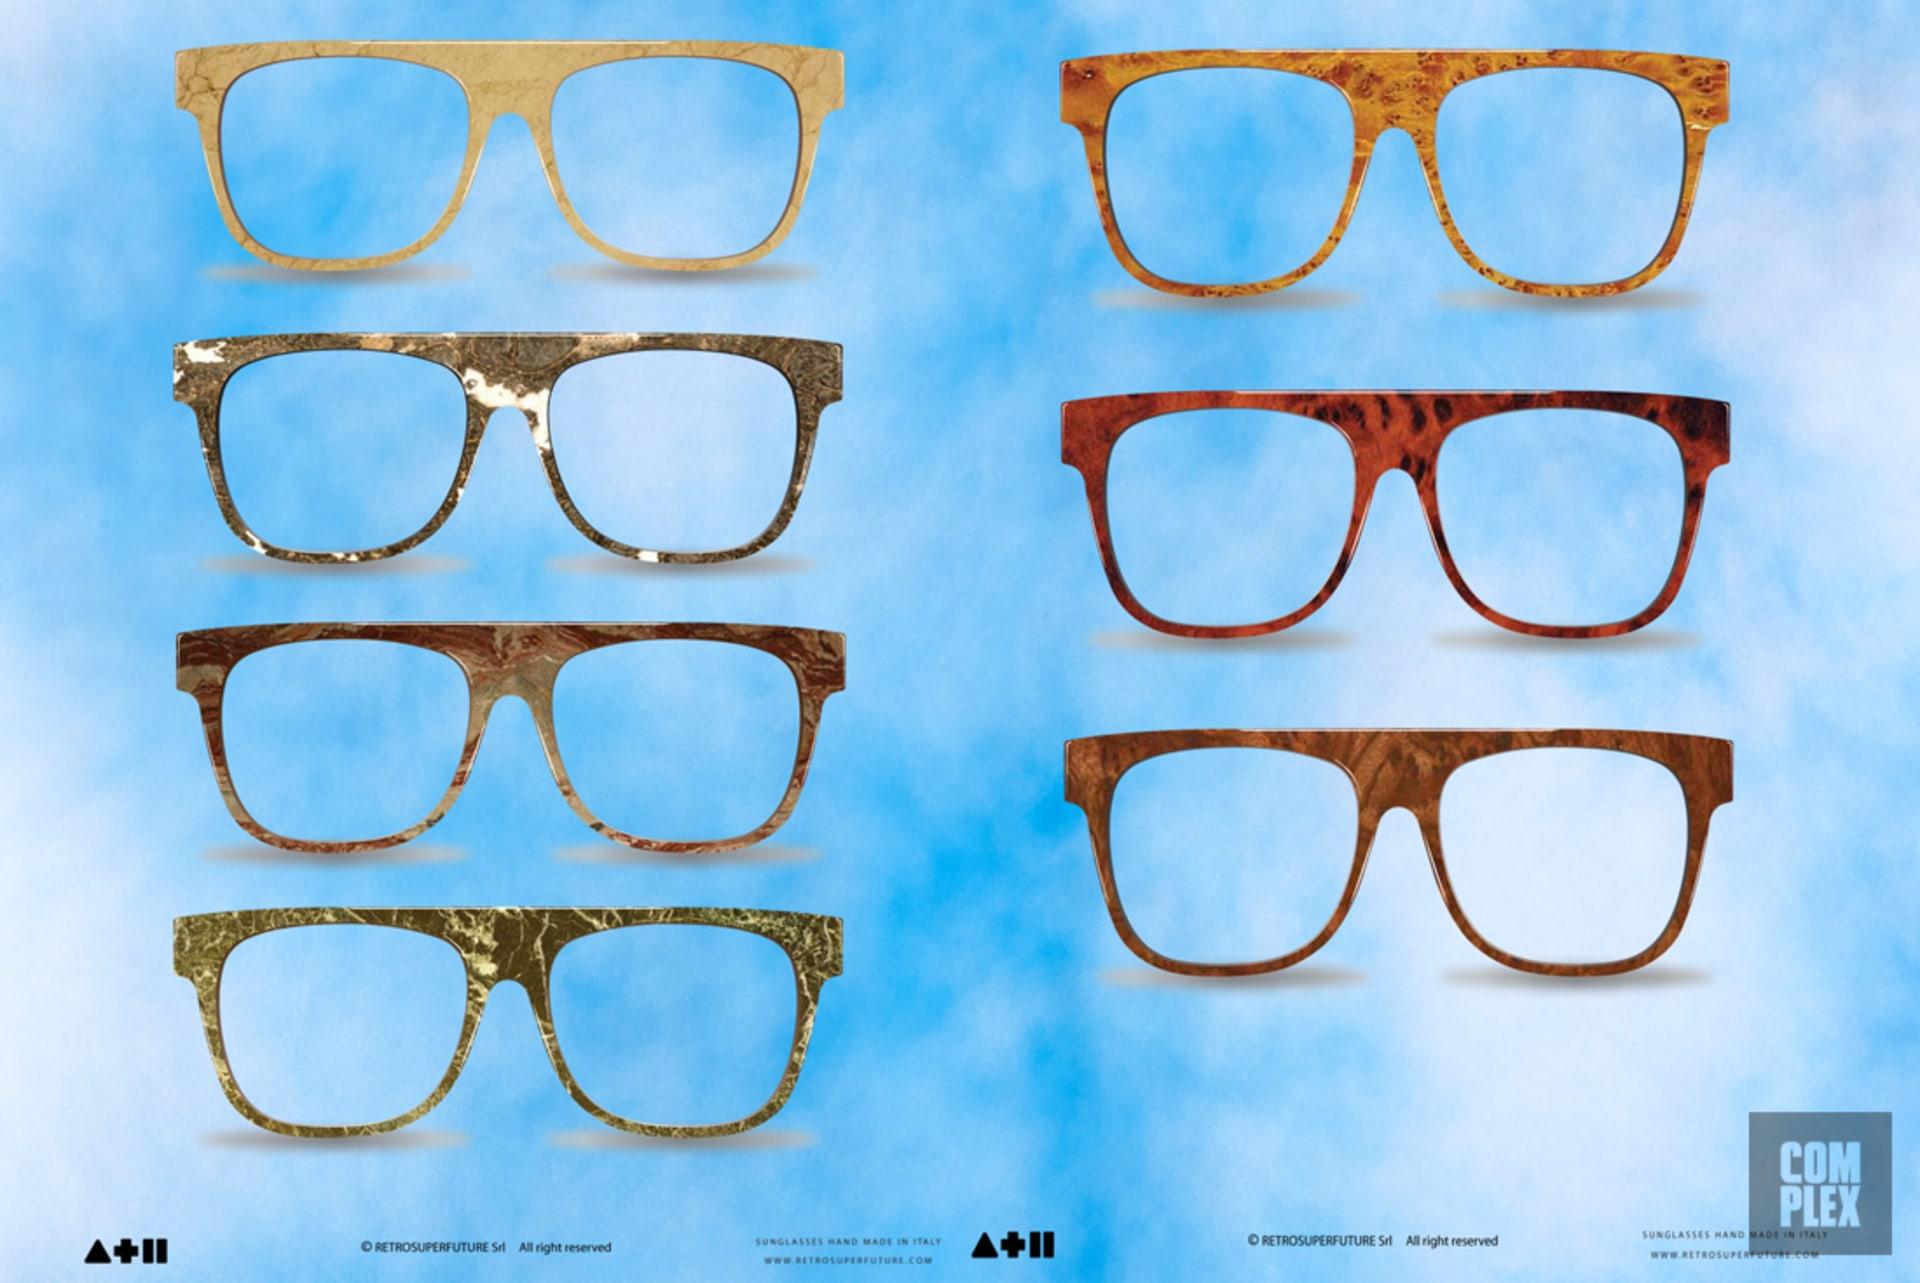 b43fa2548ec6e Samples of Pastelle sunglasses designed by Retrosuperfuture